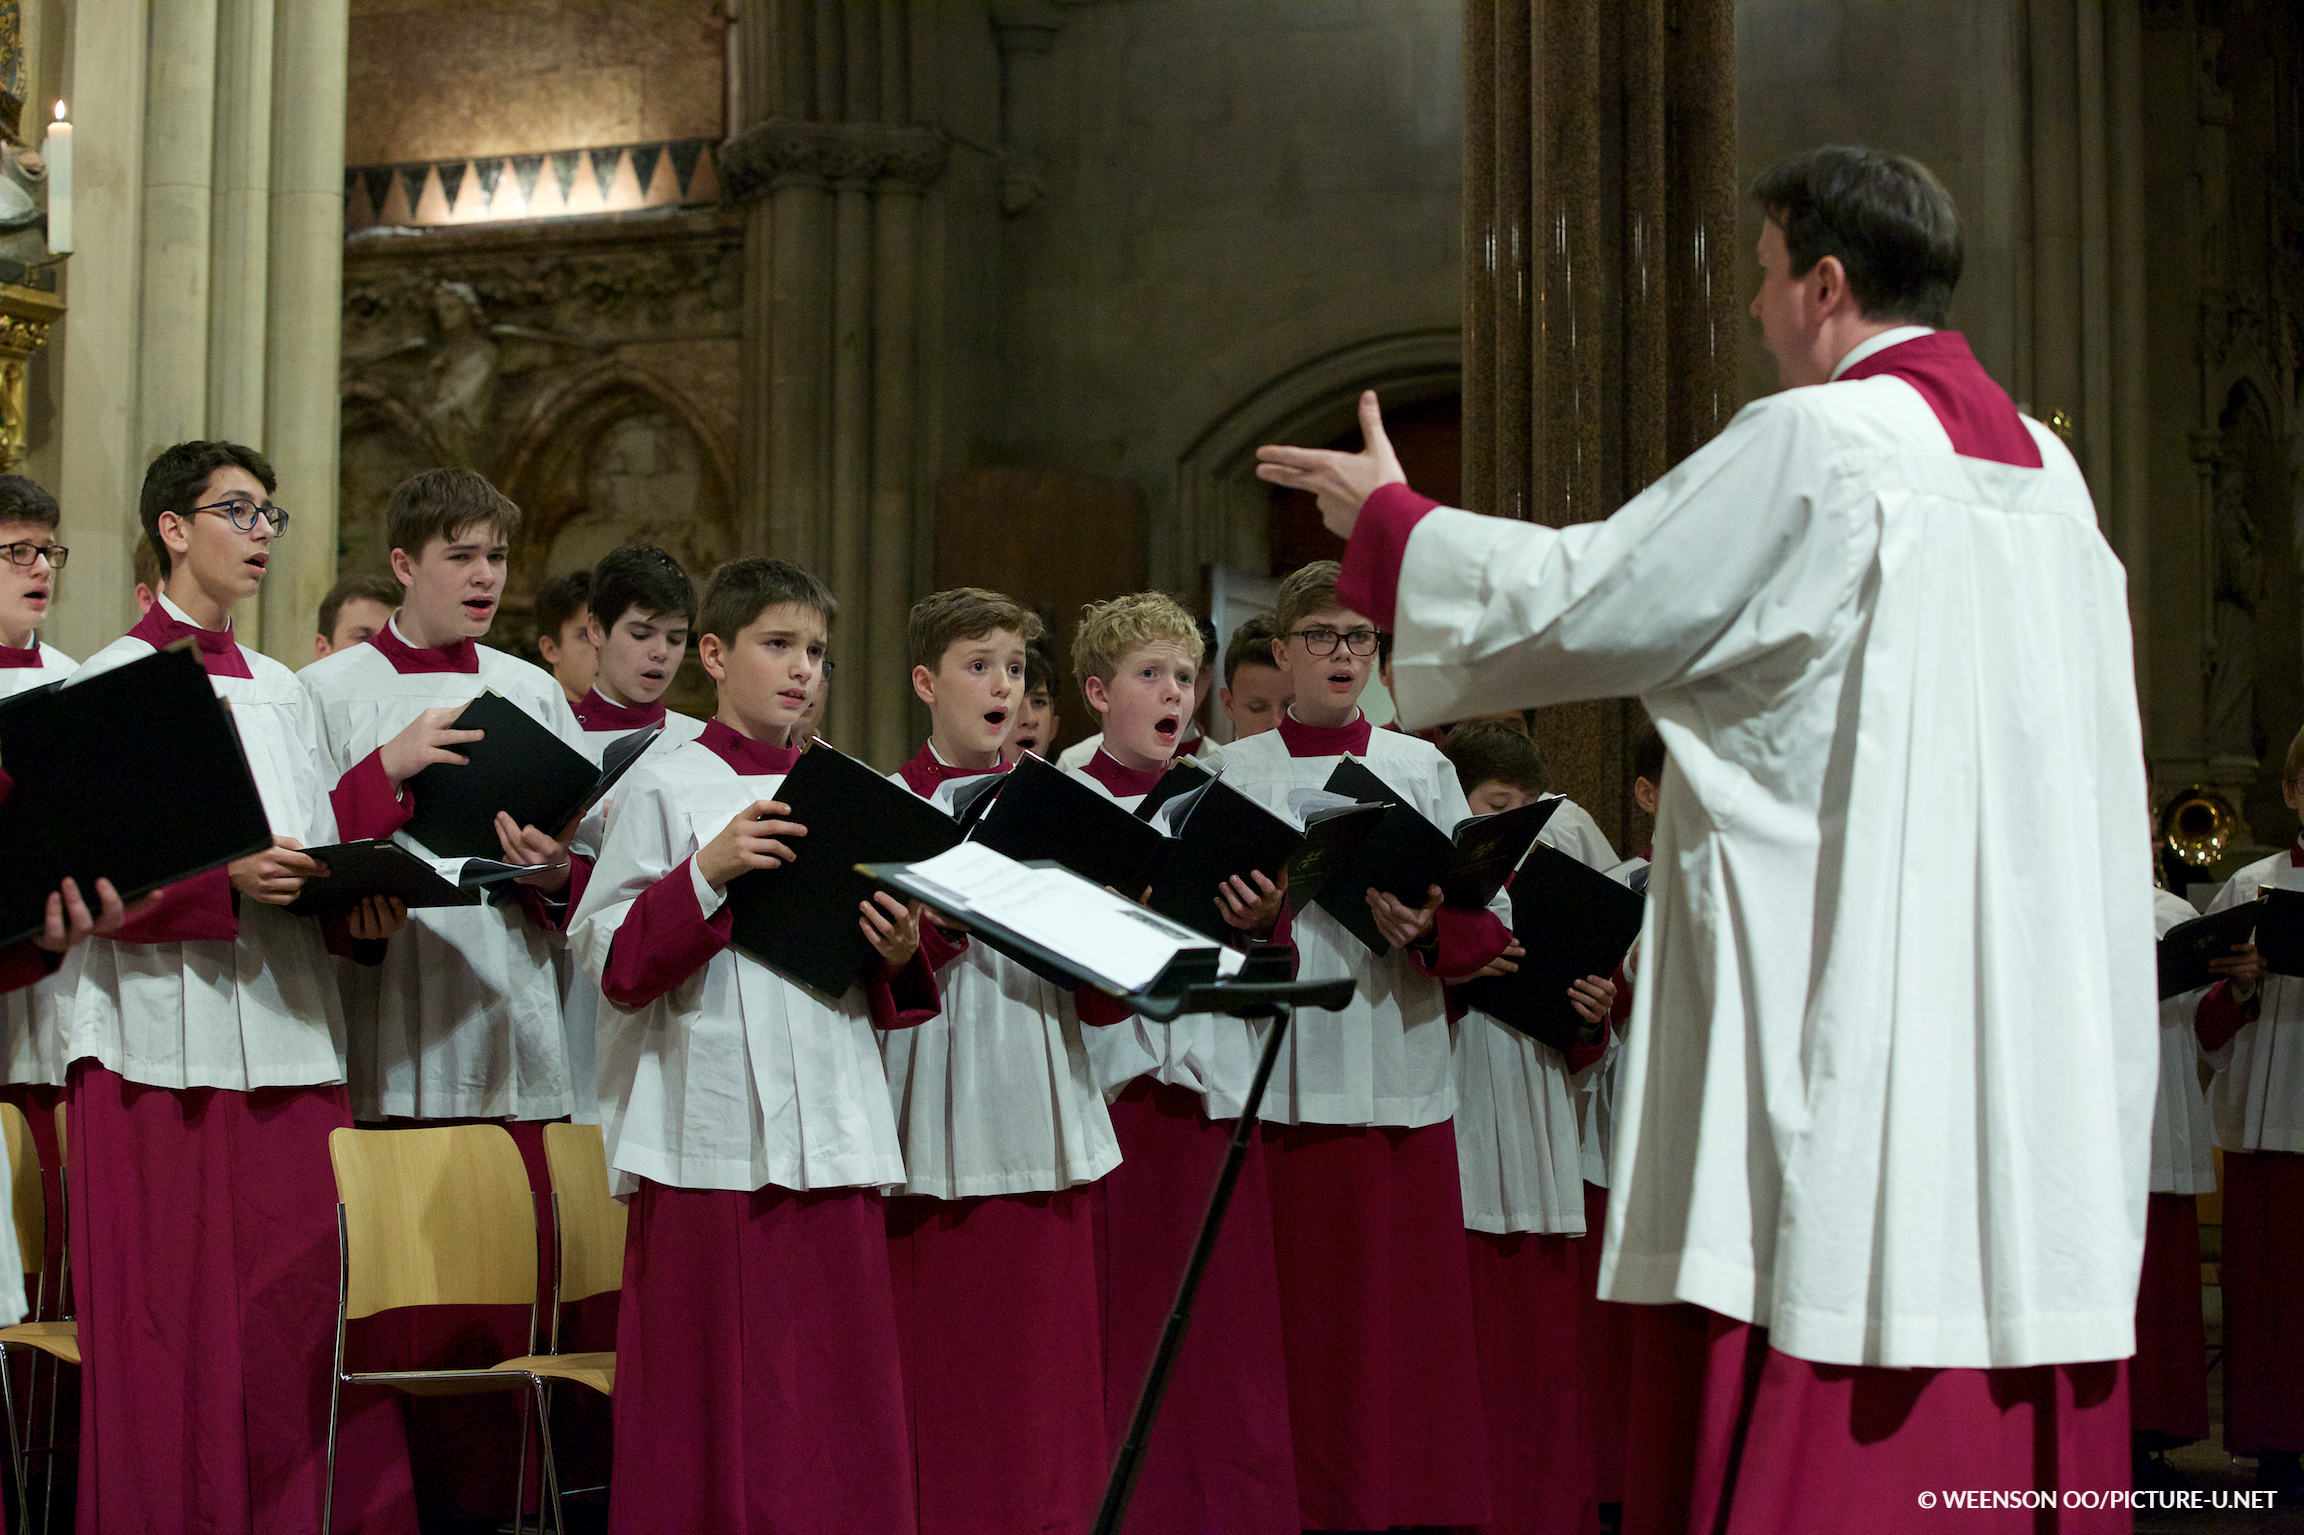 London Oratory School Schola Cantorum (© Weenson Oo/picture-u.net)